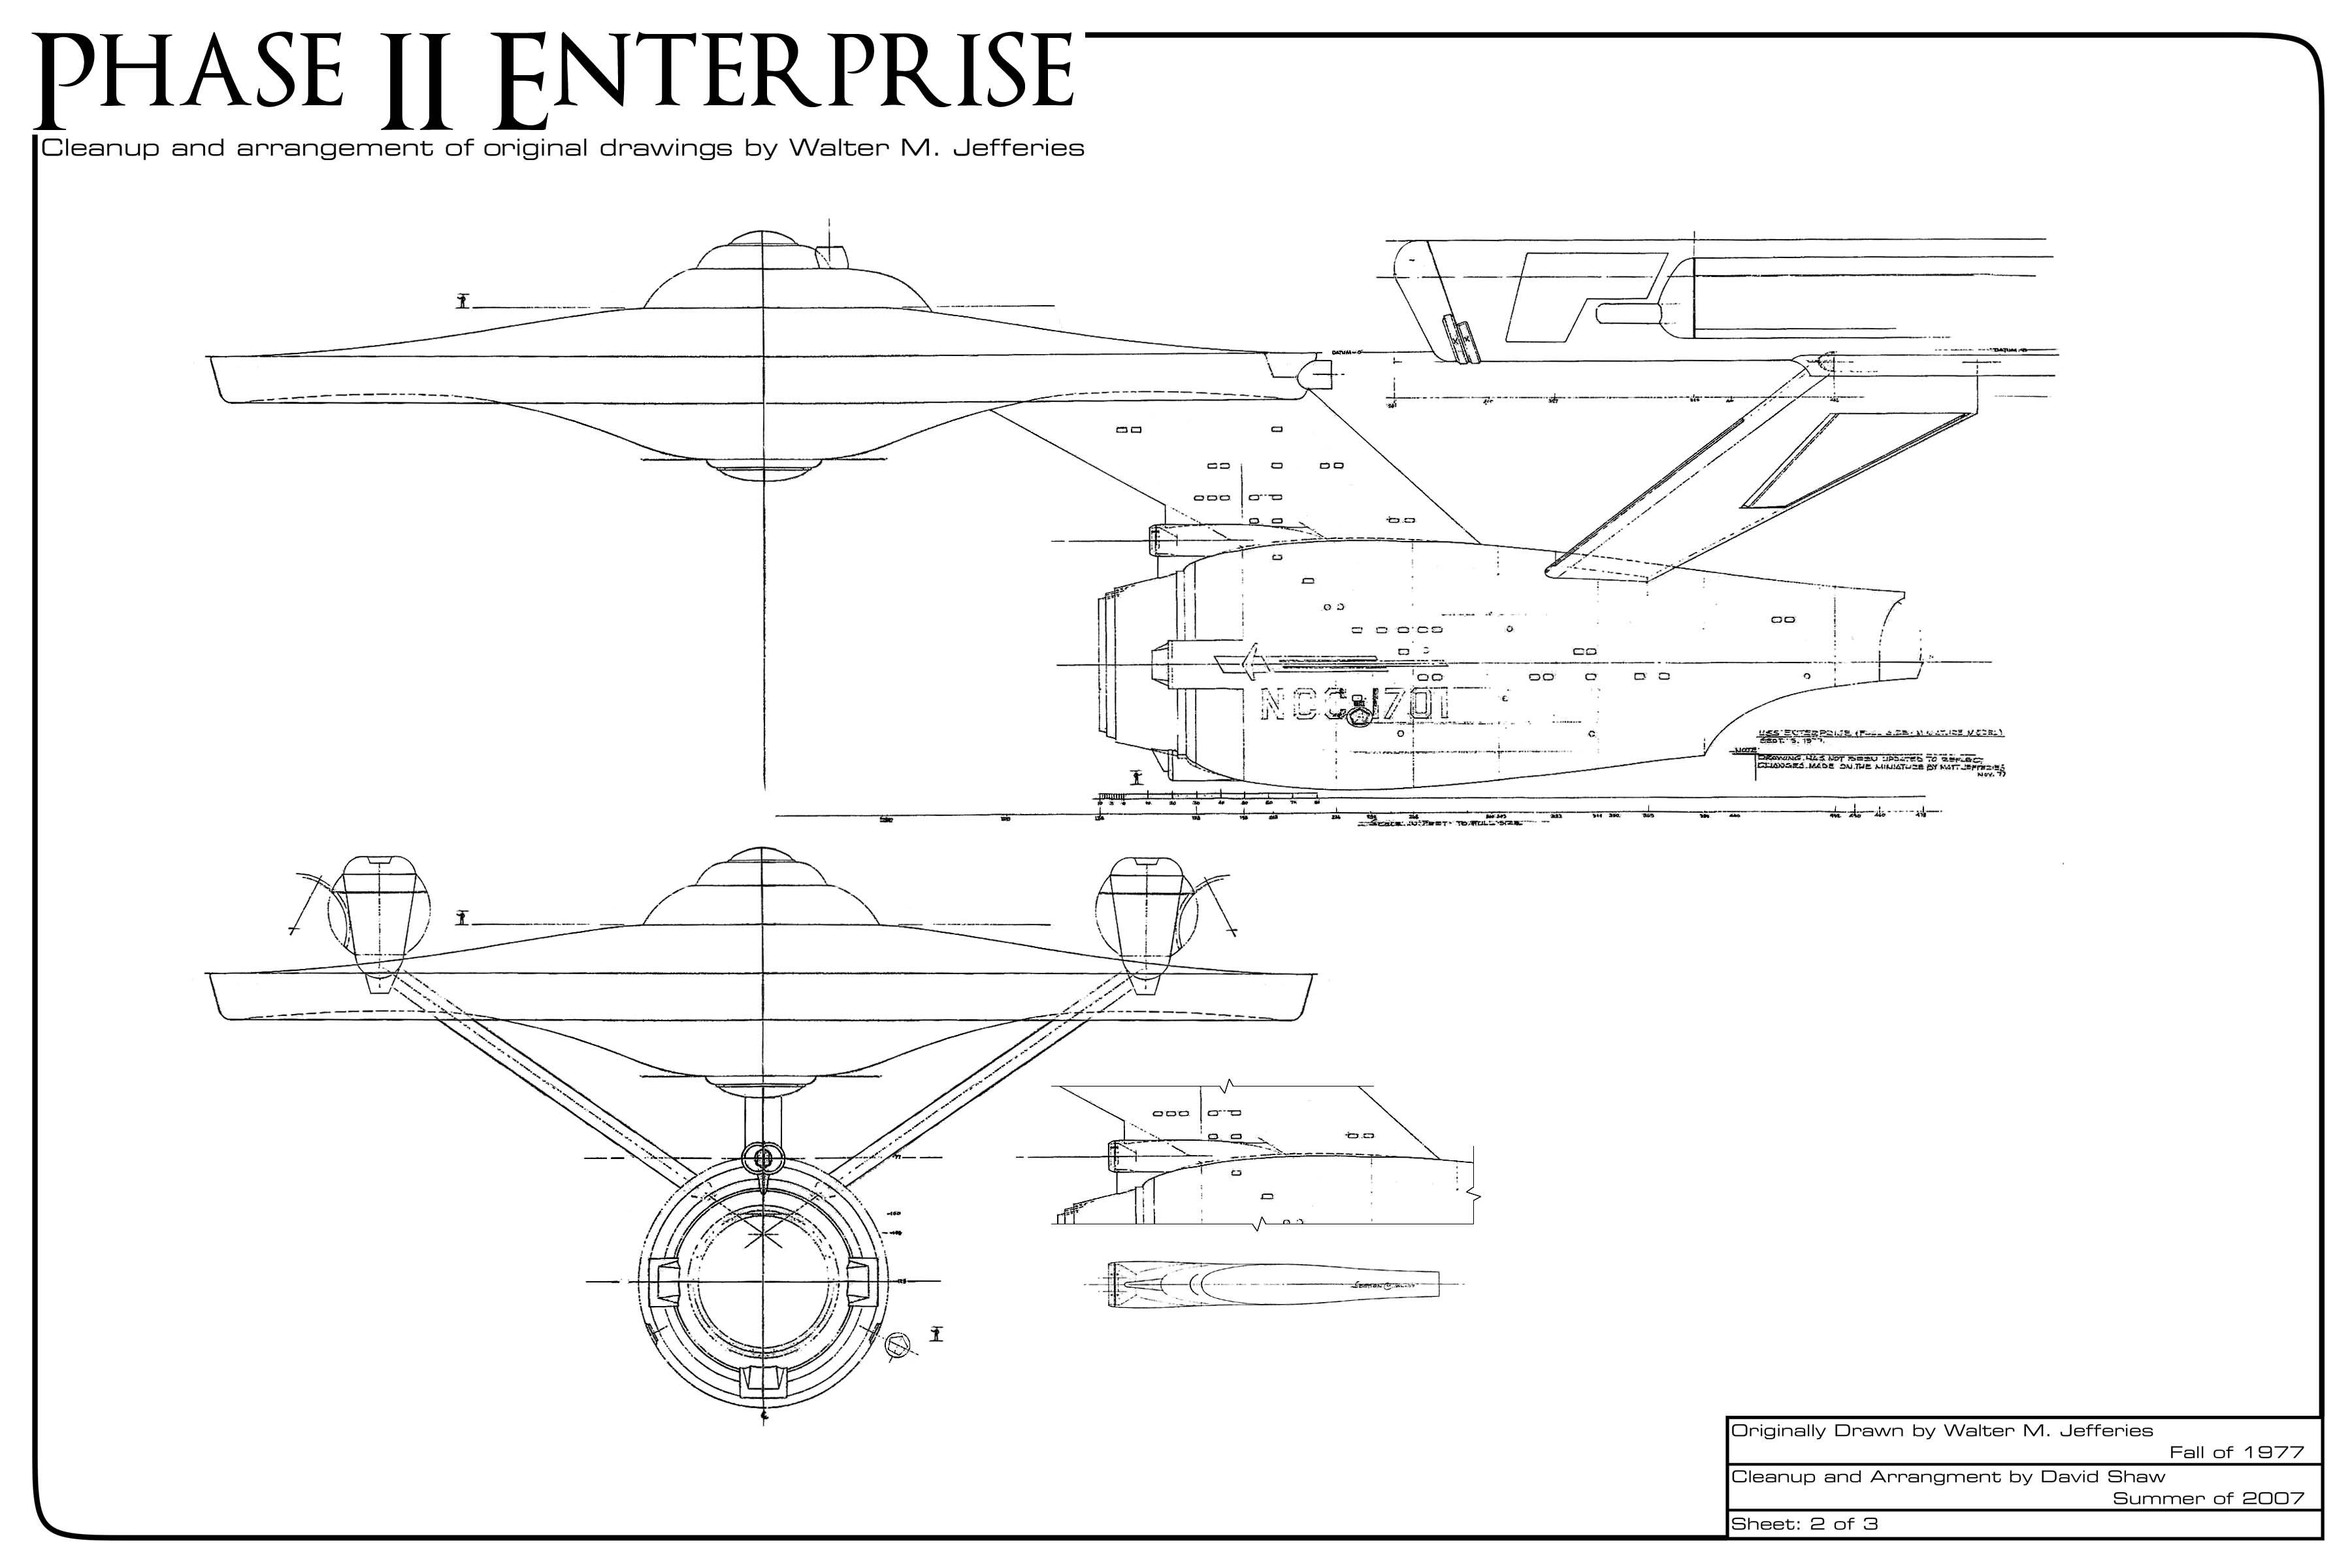 Star Trek Blueprints Phase Ii Enterprise Clean Up Project